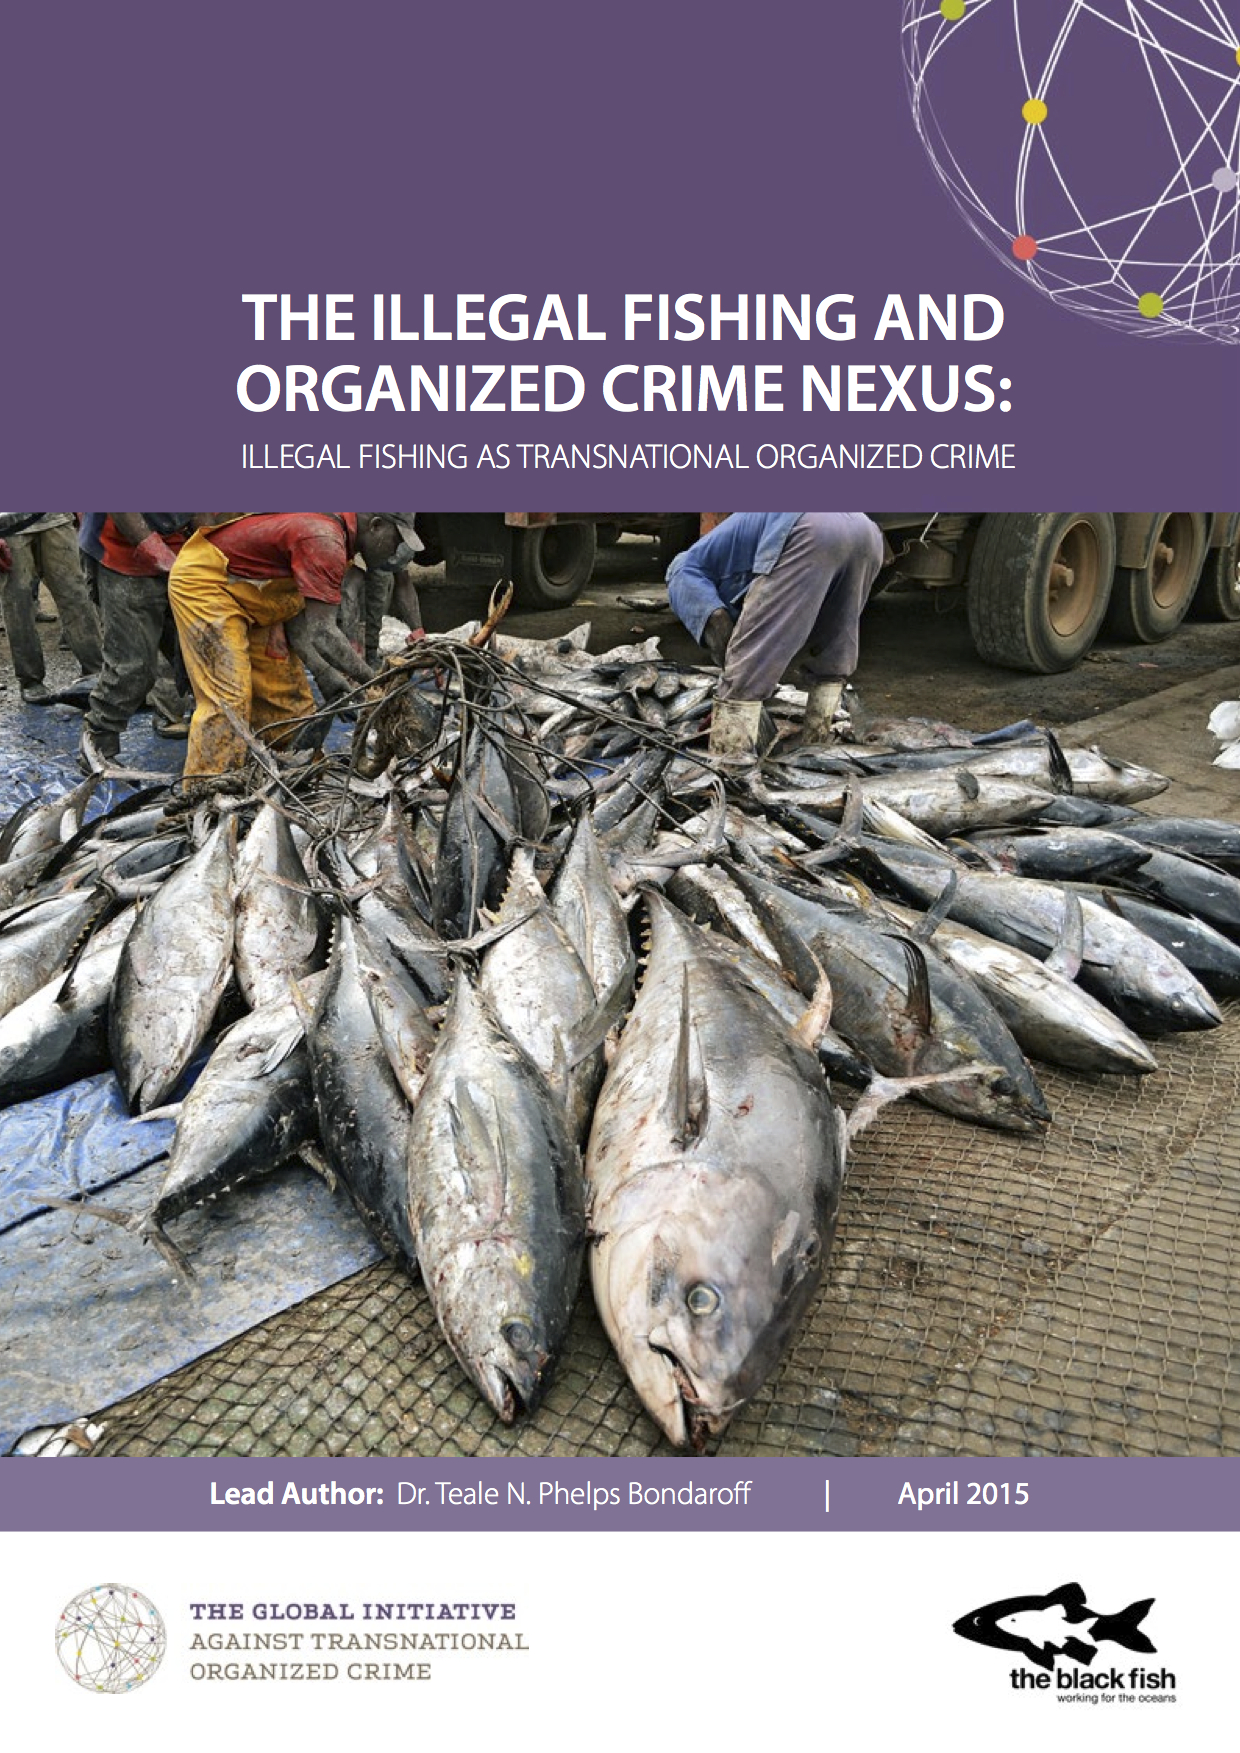 theblackfish_GI_FishingCrime2015_Cover_KukkaRanta